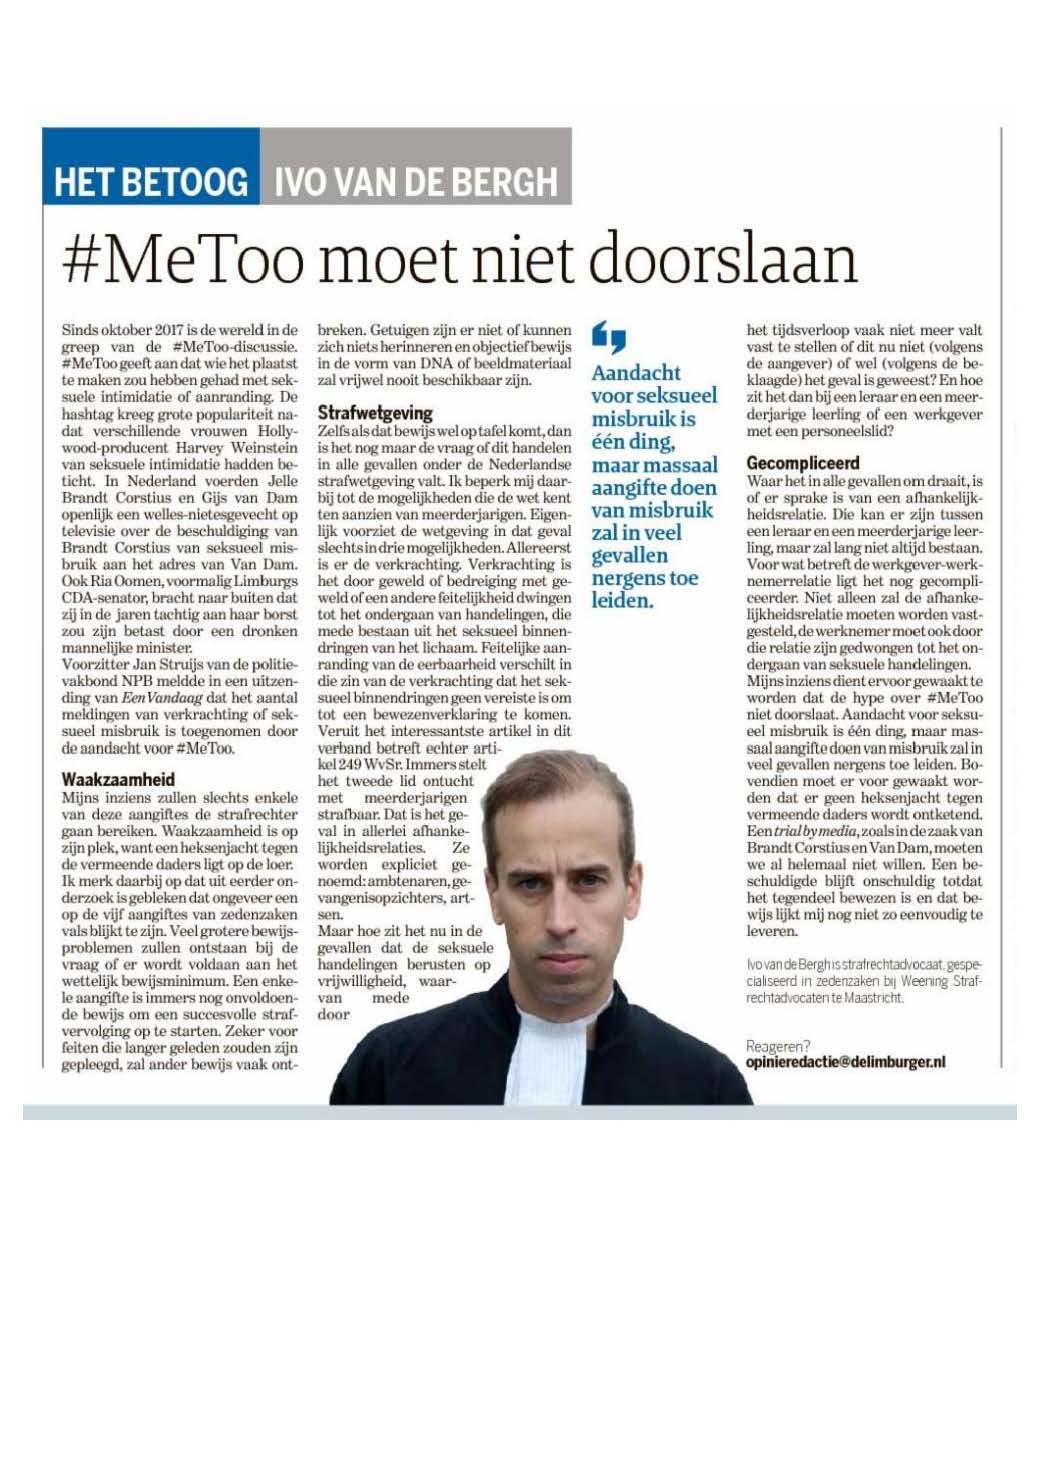 Artikel Ivo metoo